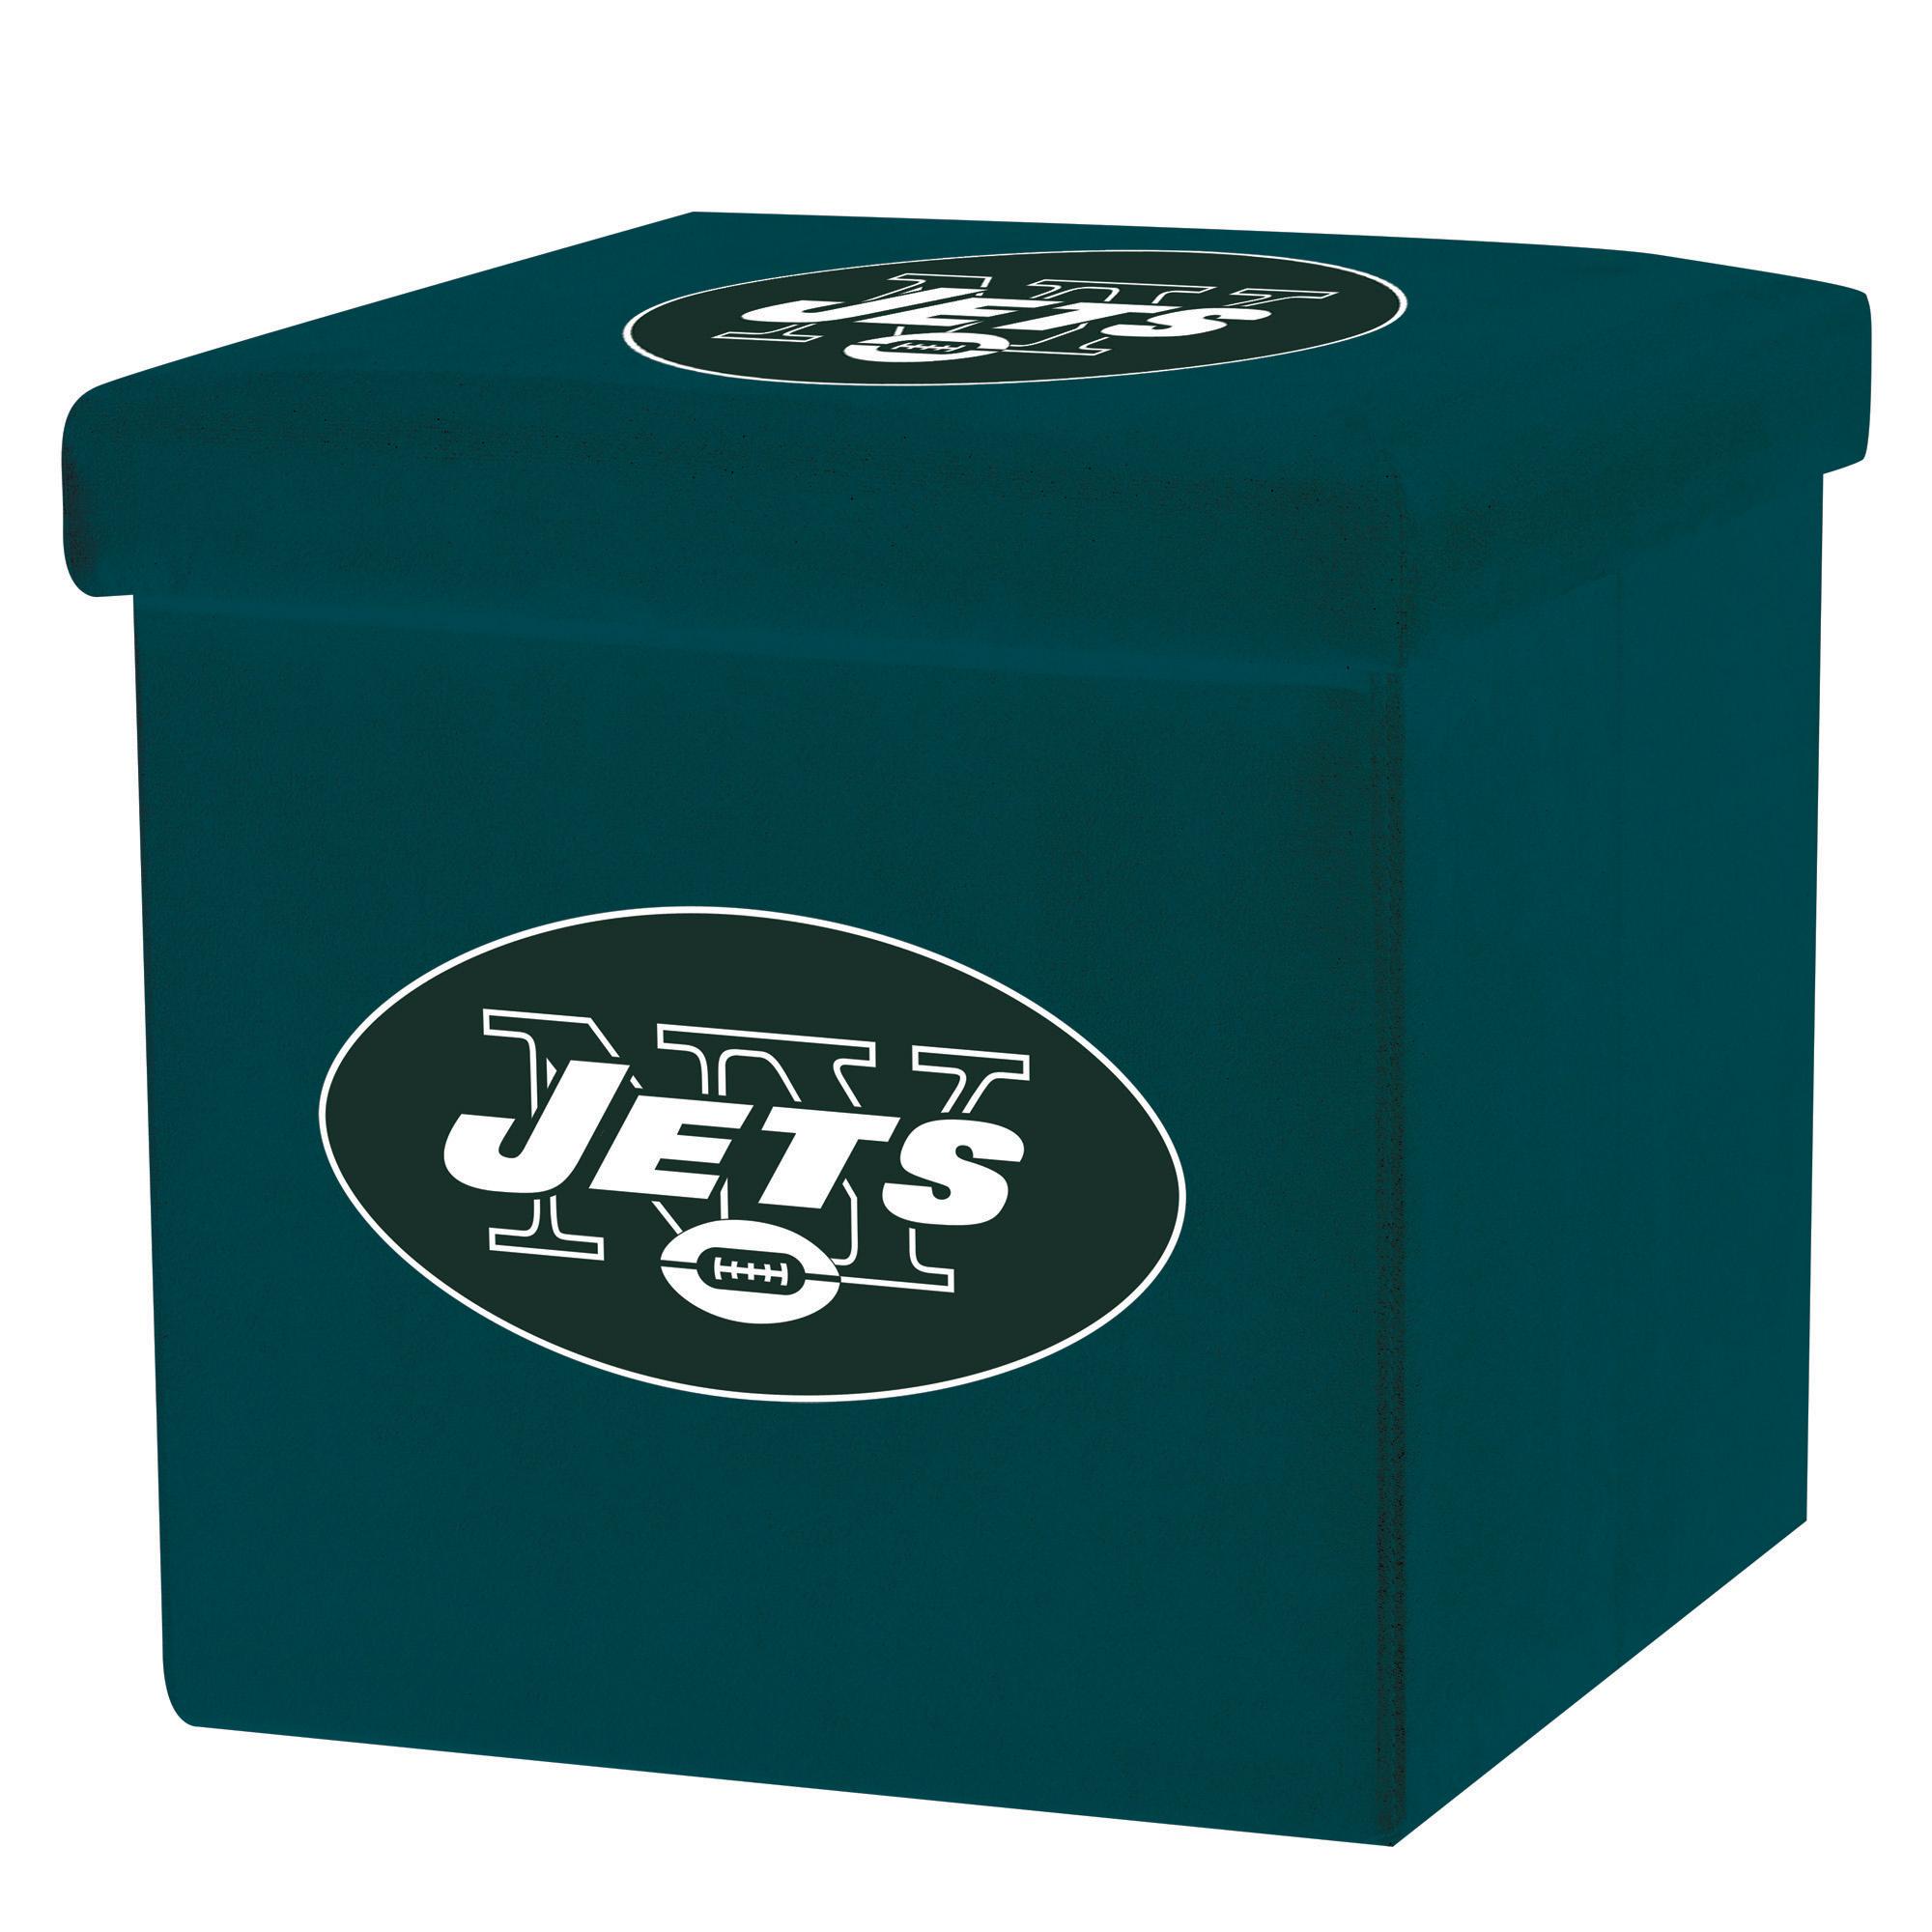 Franklin Sports NFL New York Jets Storage Ottoman with Detachable Lid